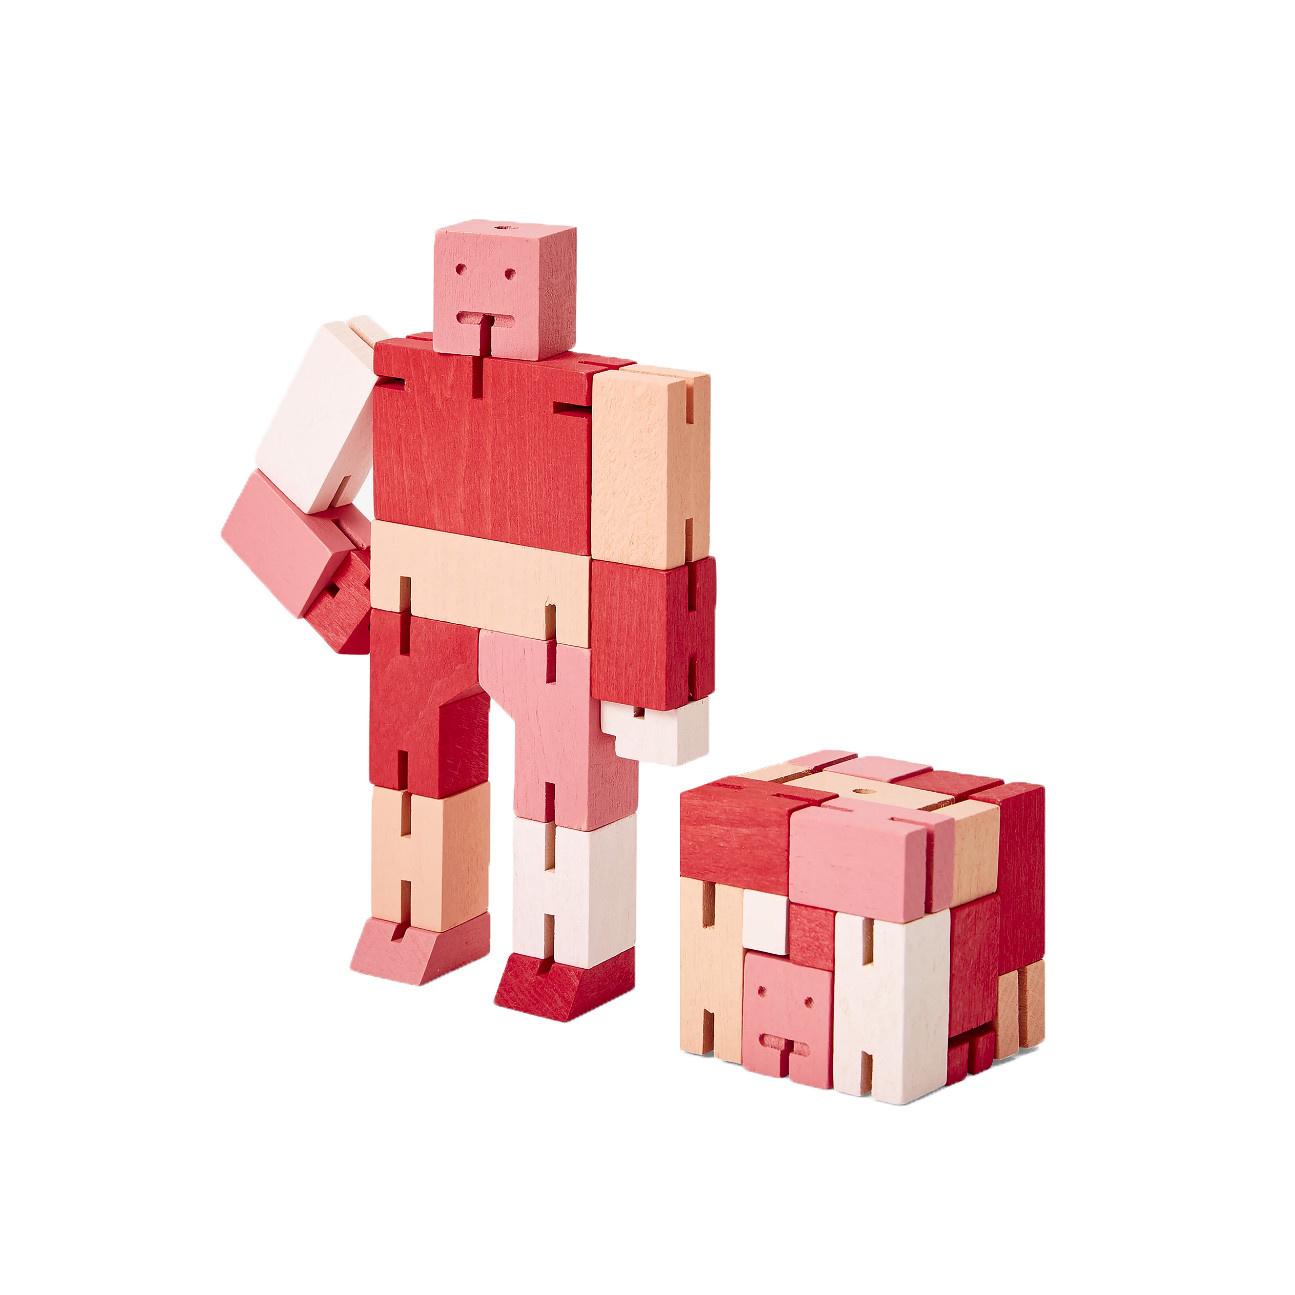 Cubebot Capsule Micro - Red Multi